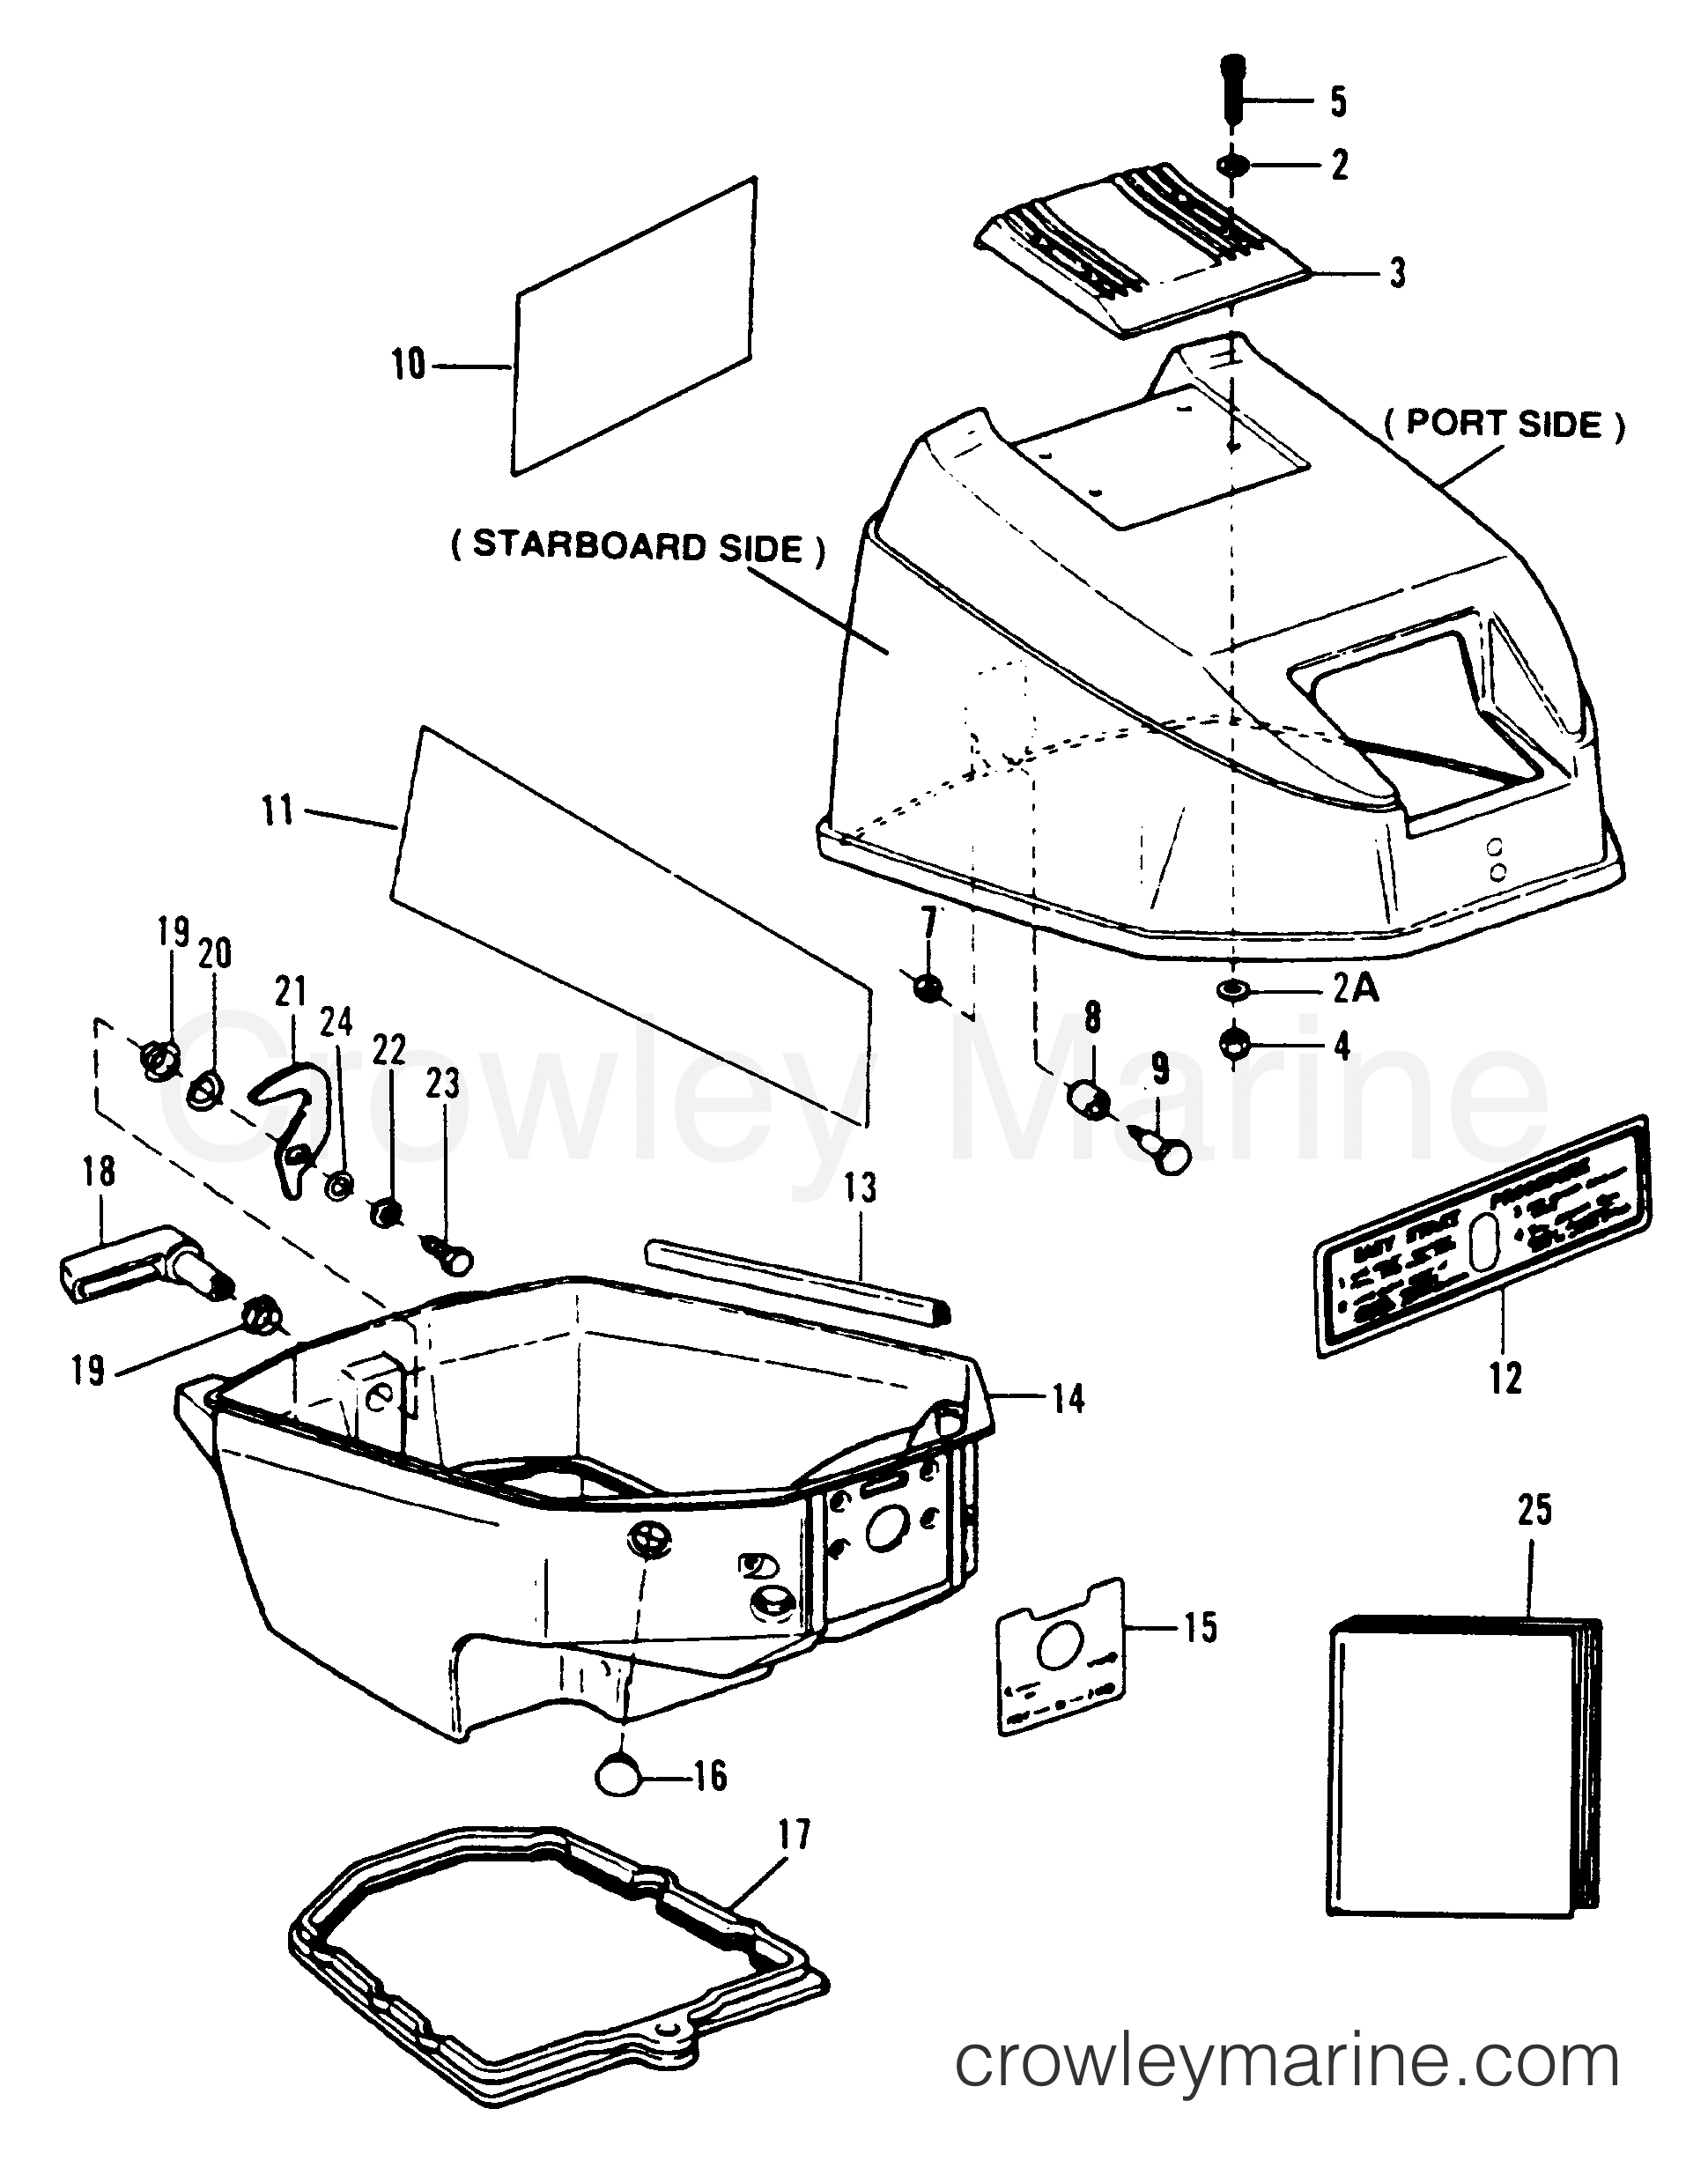 cowl assembly - top  u0026 bottom